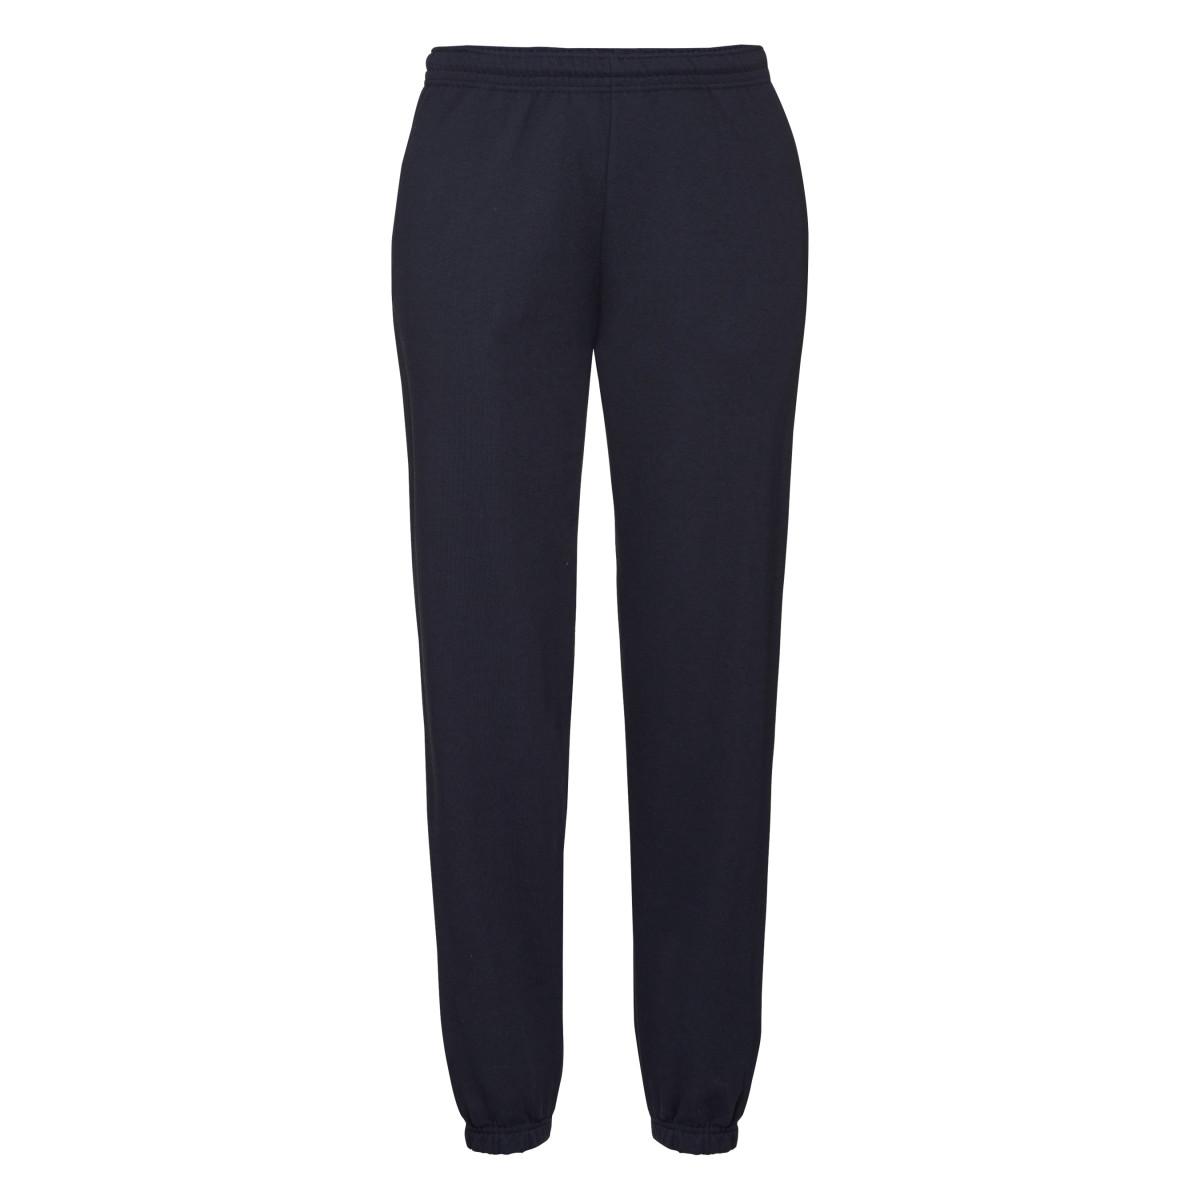 Elasticated Jog Pants